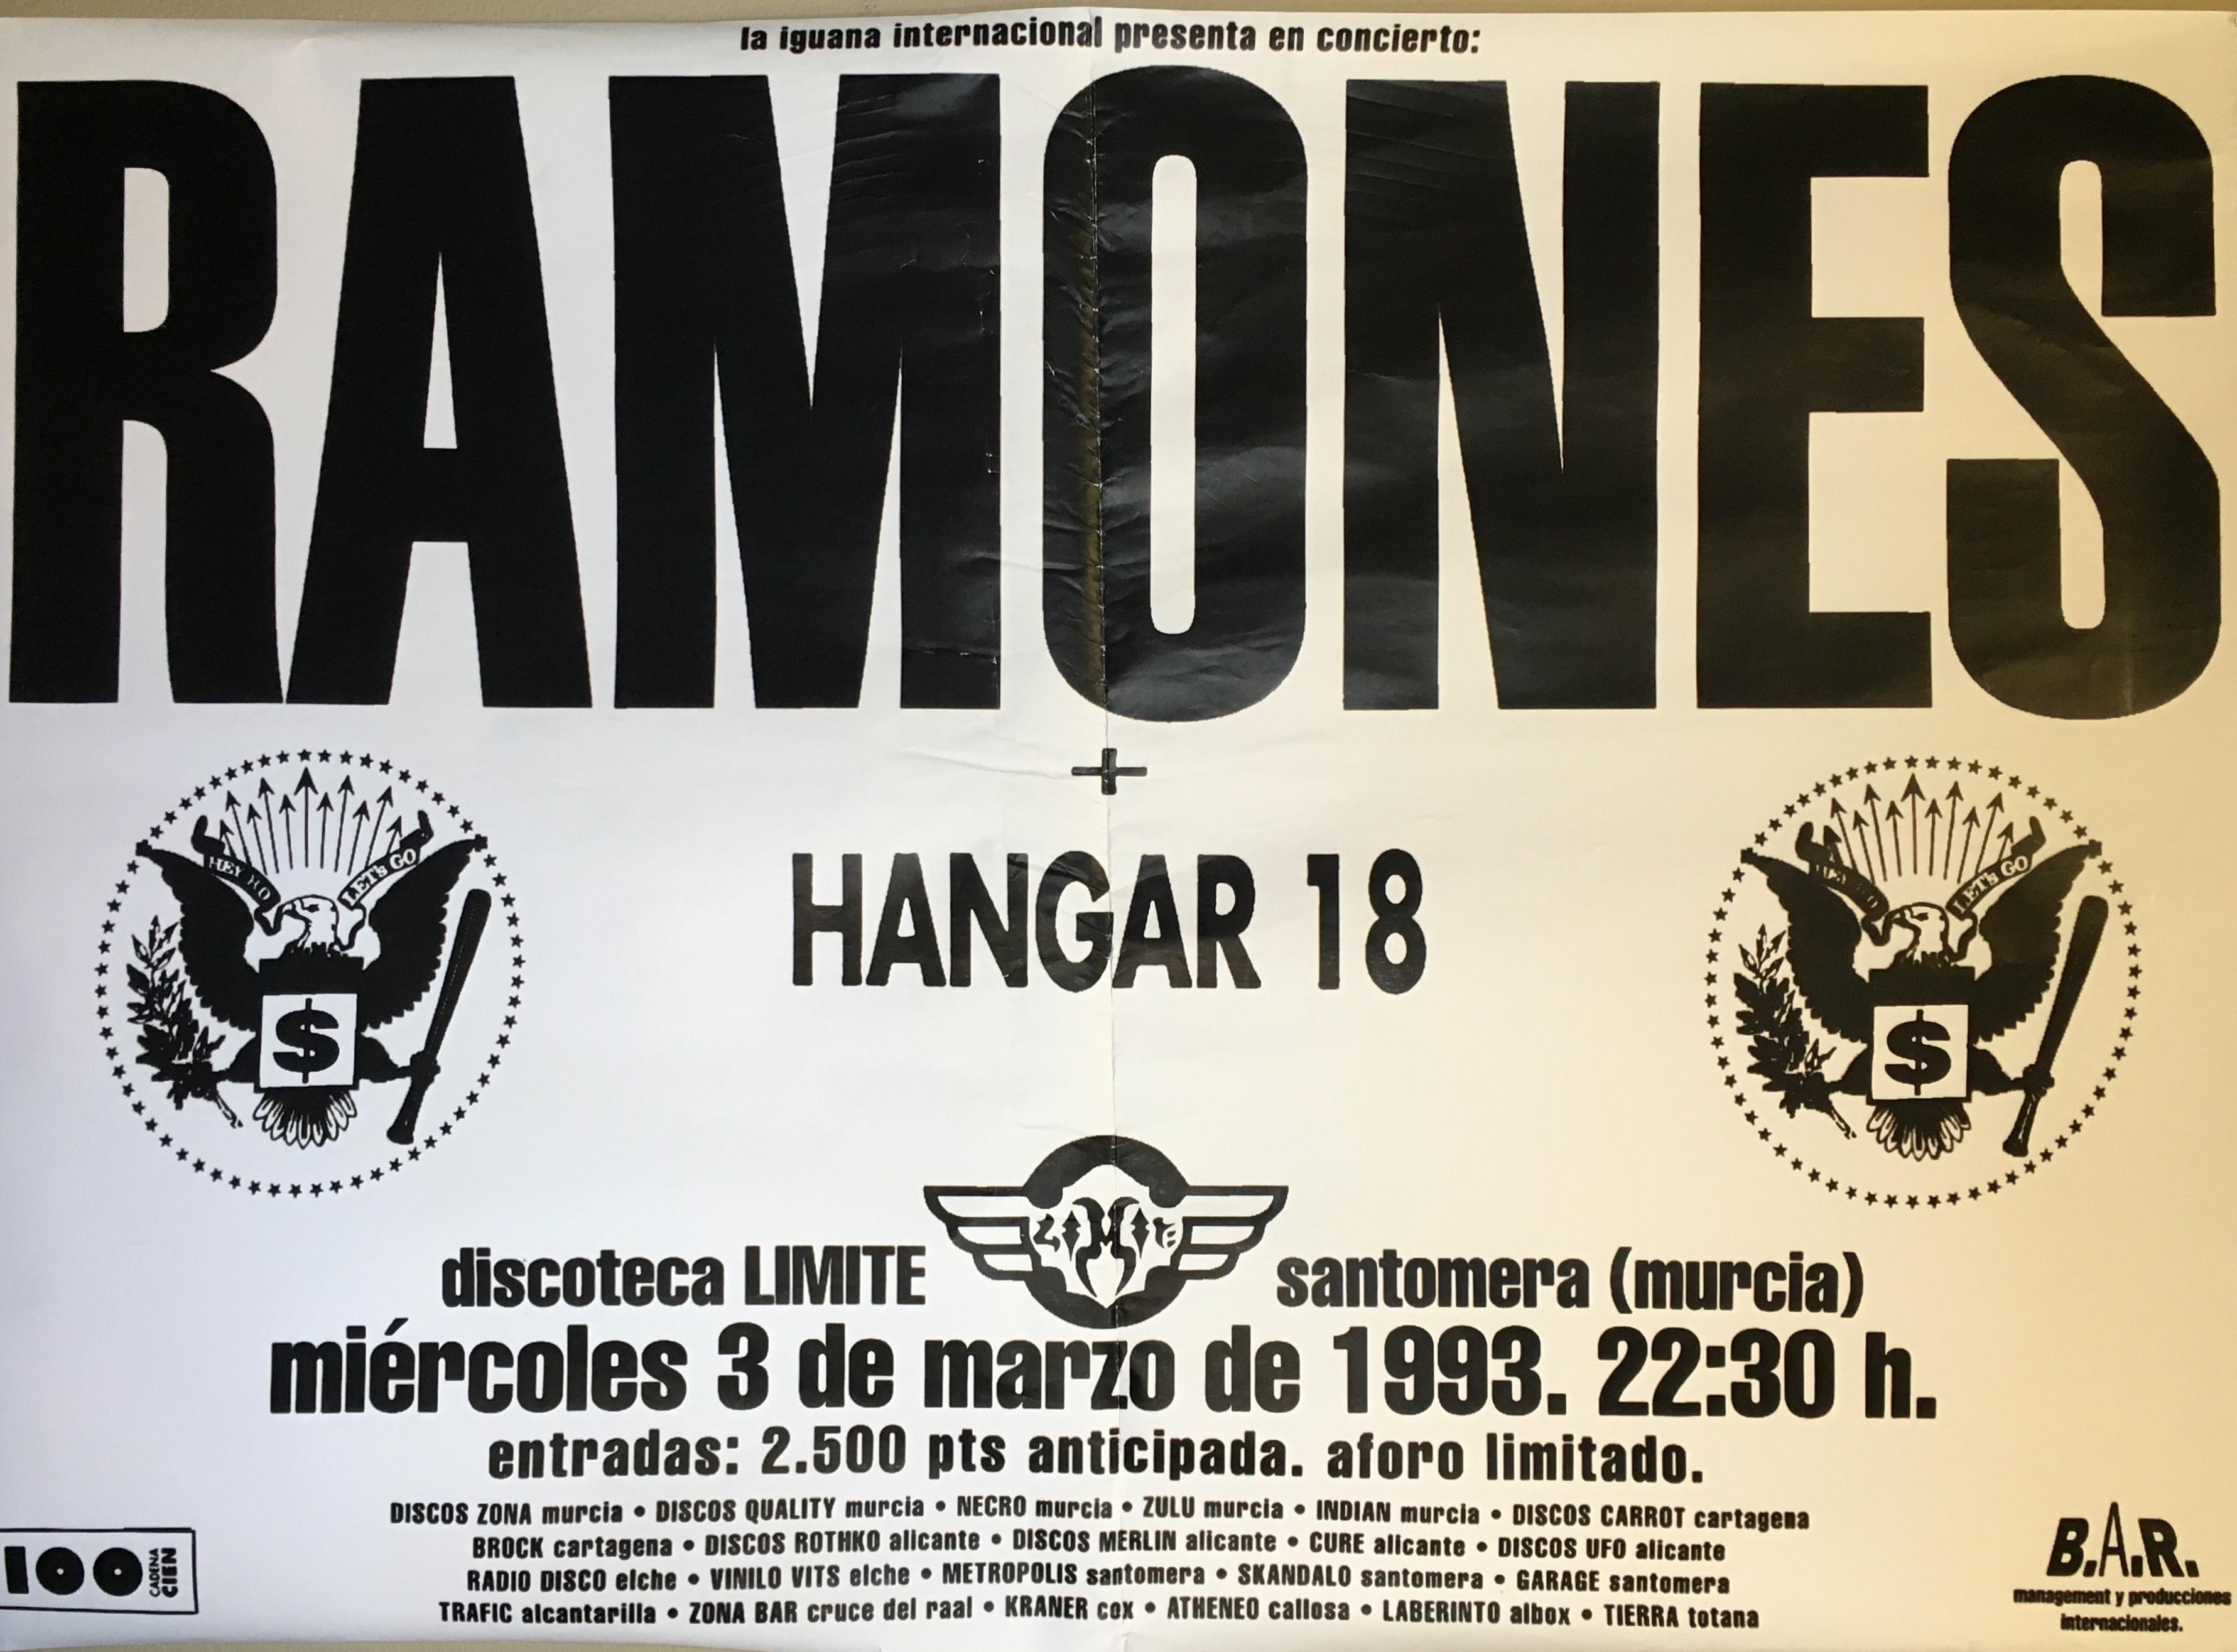 1993-06-03 MURCIA, SPAIN